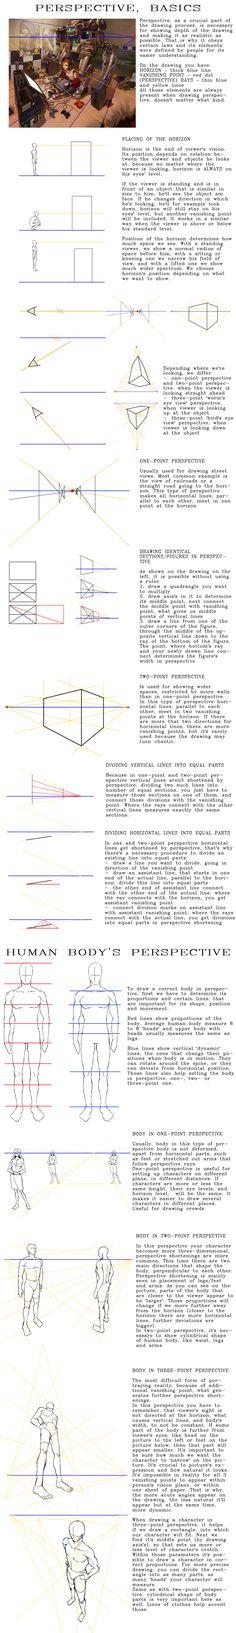 tutorial on perspective by dzioo on deviantART